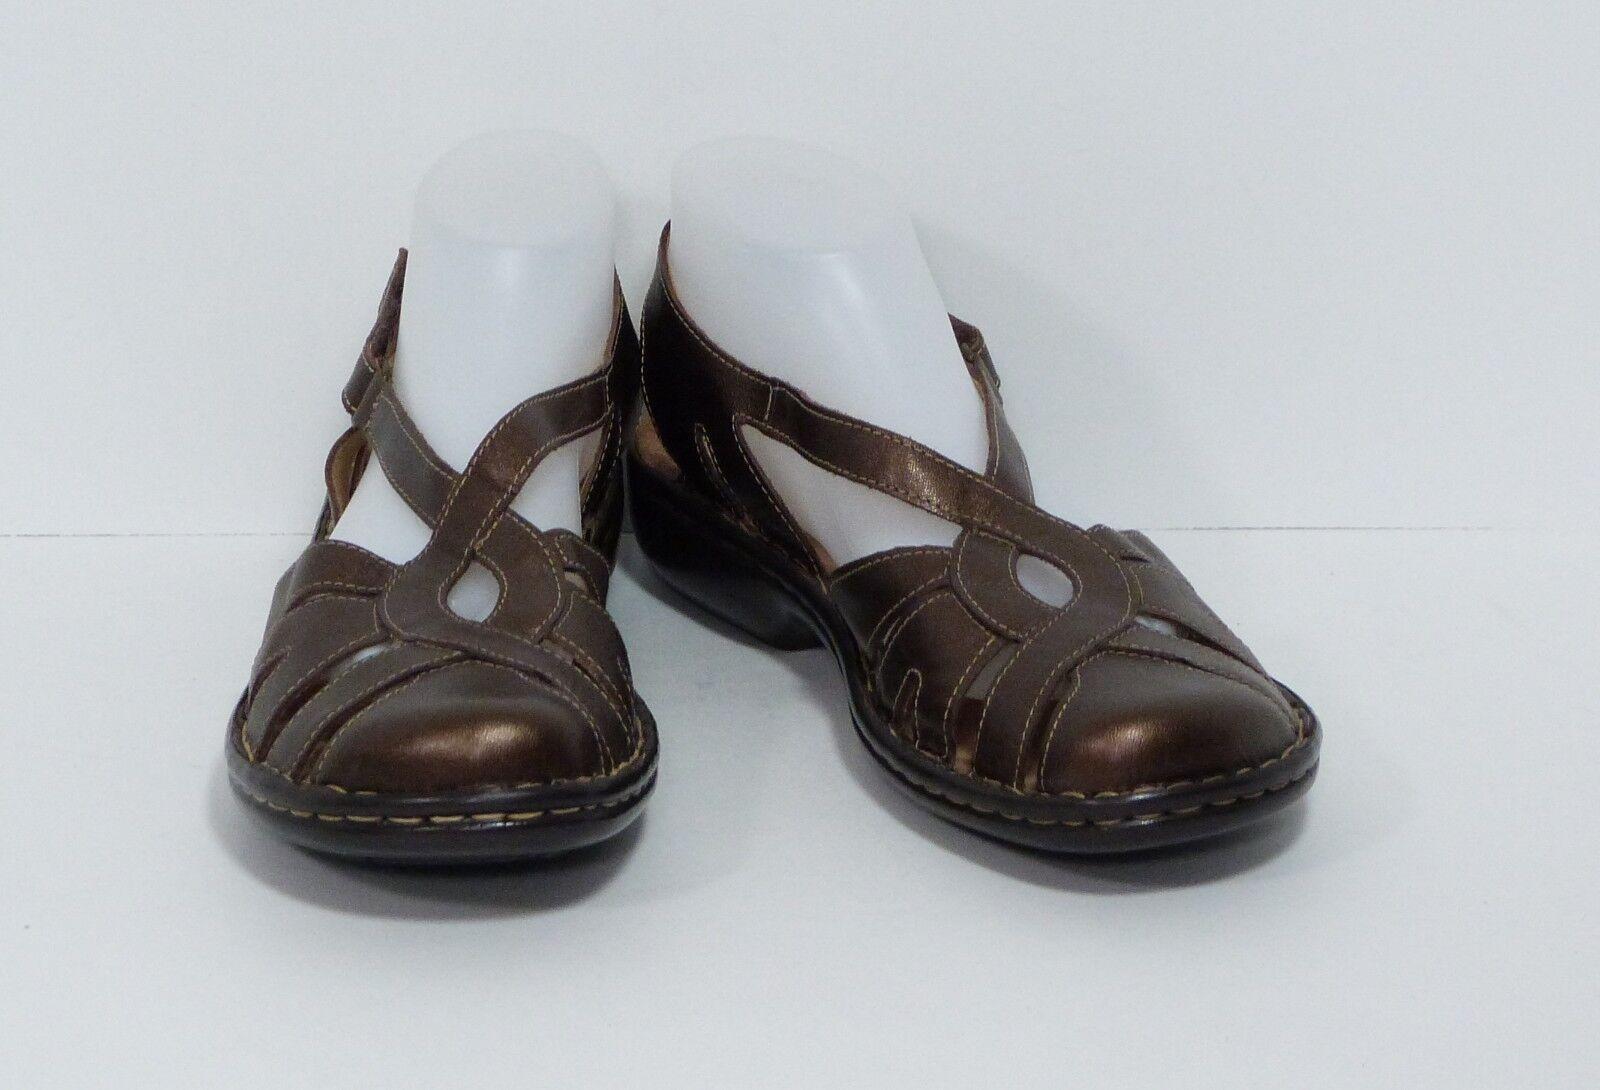 CLARKS Active Air Leather Sandals Metallic Bronze Closed Toe Women's 10 US EUC